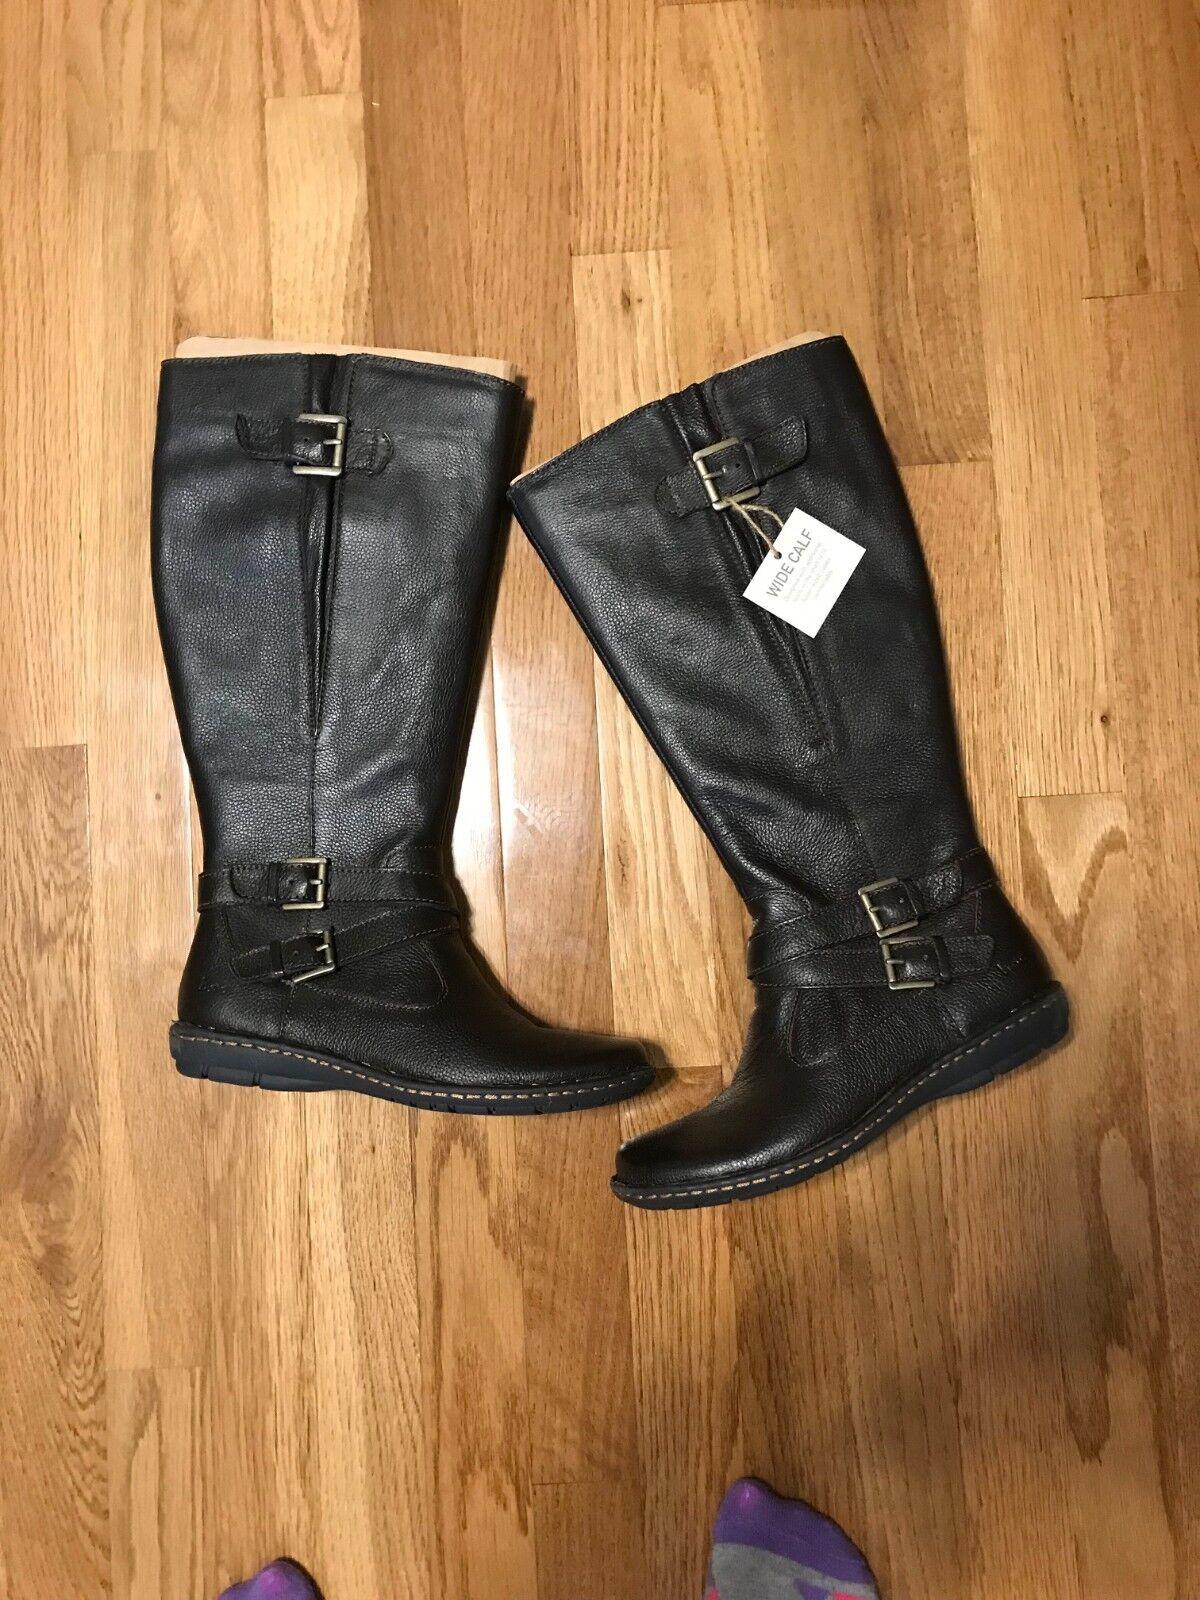 NEU 149 B.O.C Barbana Dark Braun Wide Calf Stiefel NIB